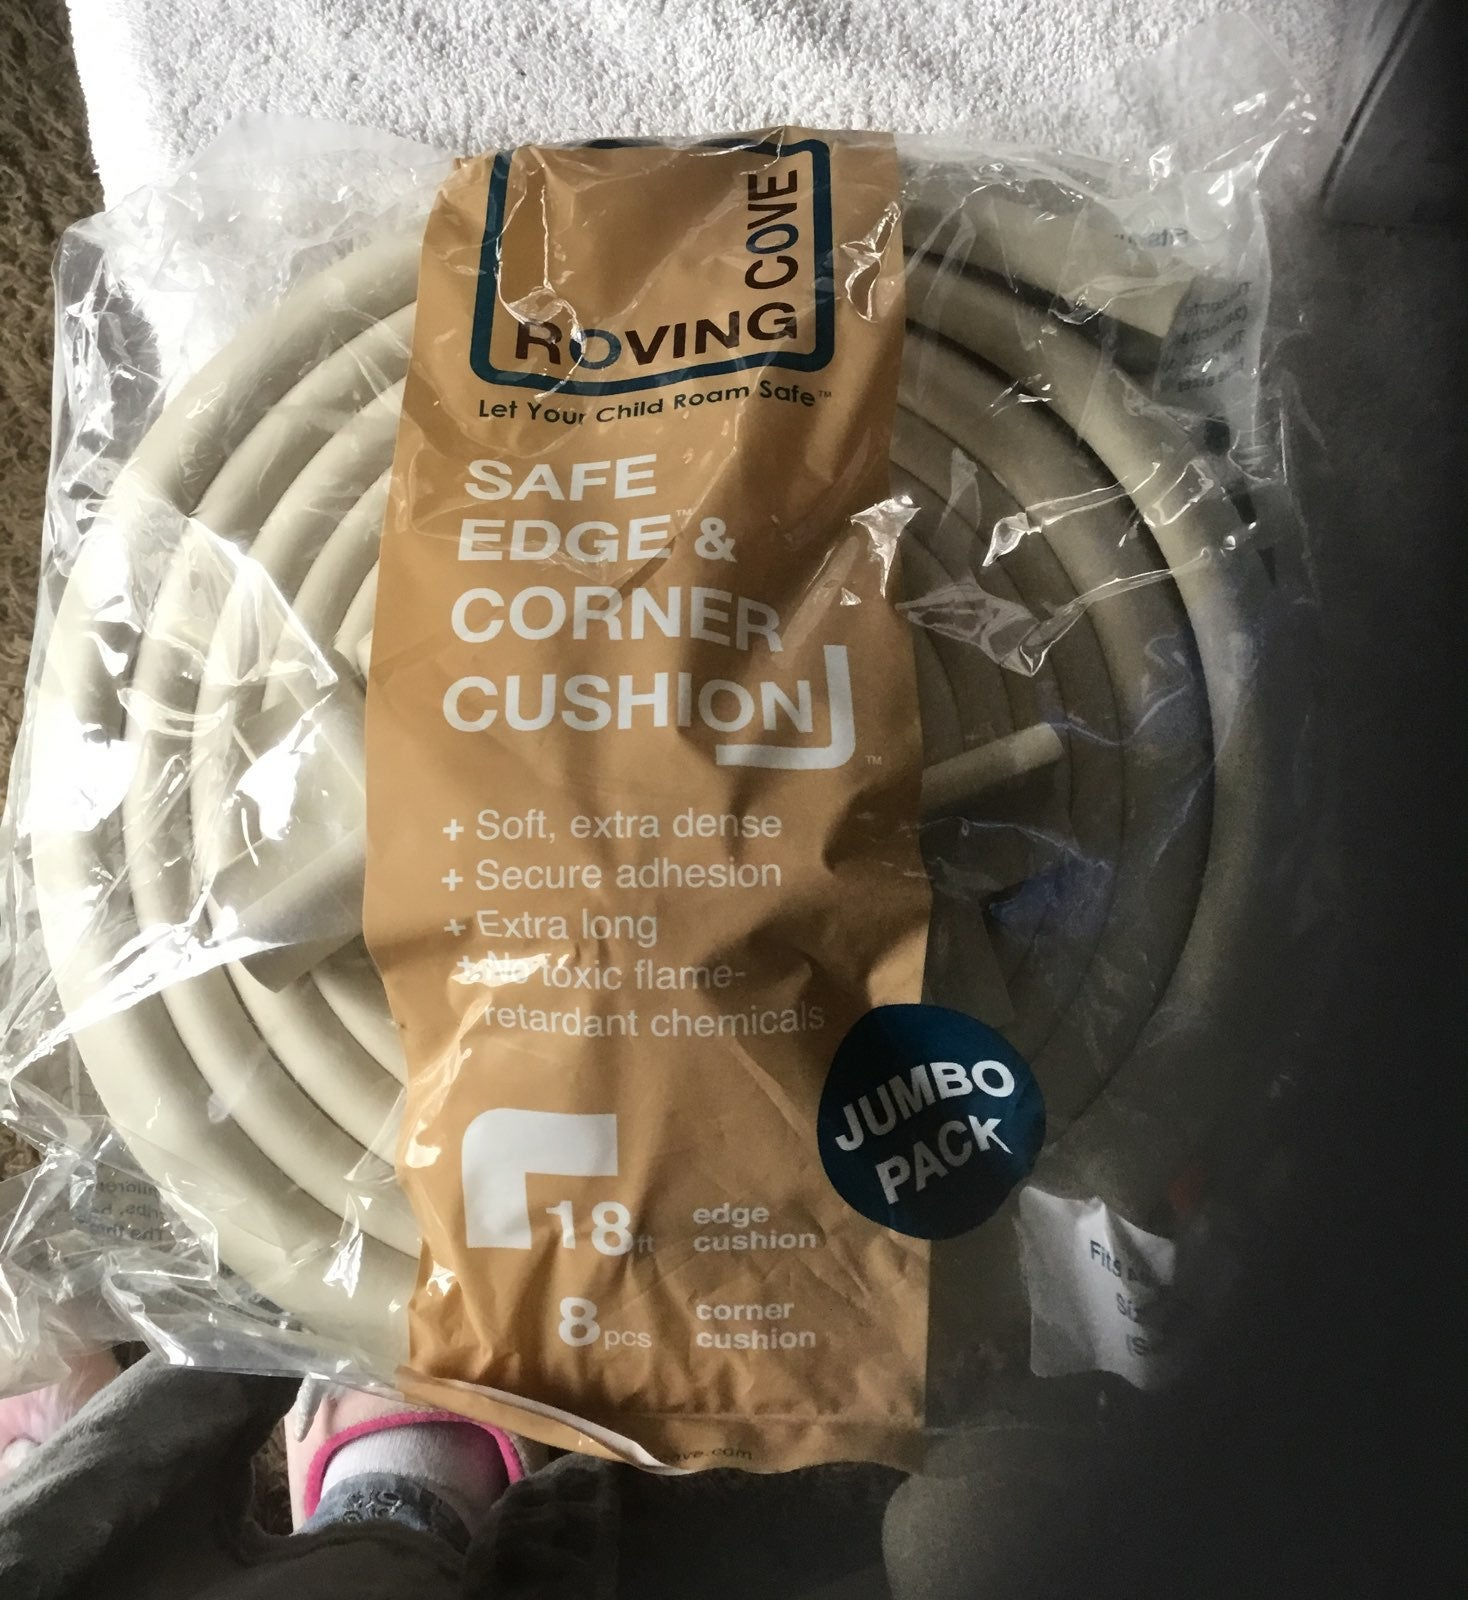 Safe edge & coner cushion jumbo pack